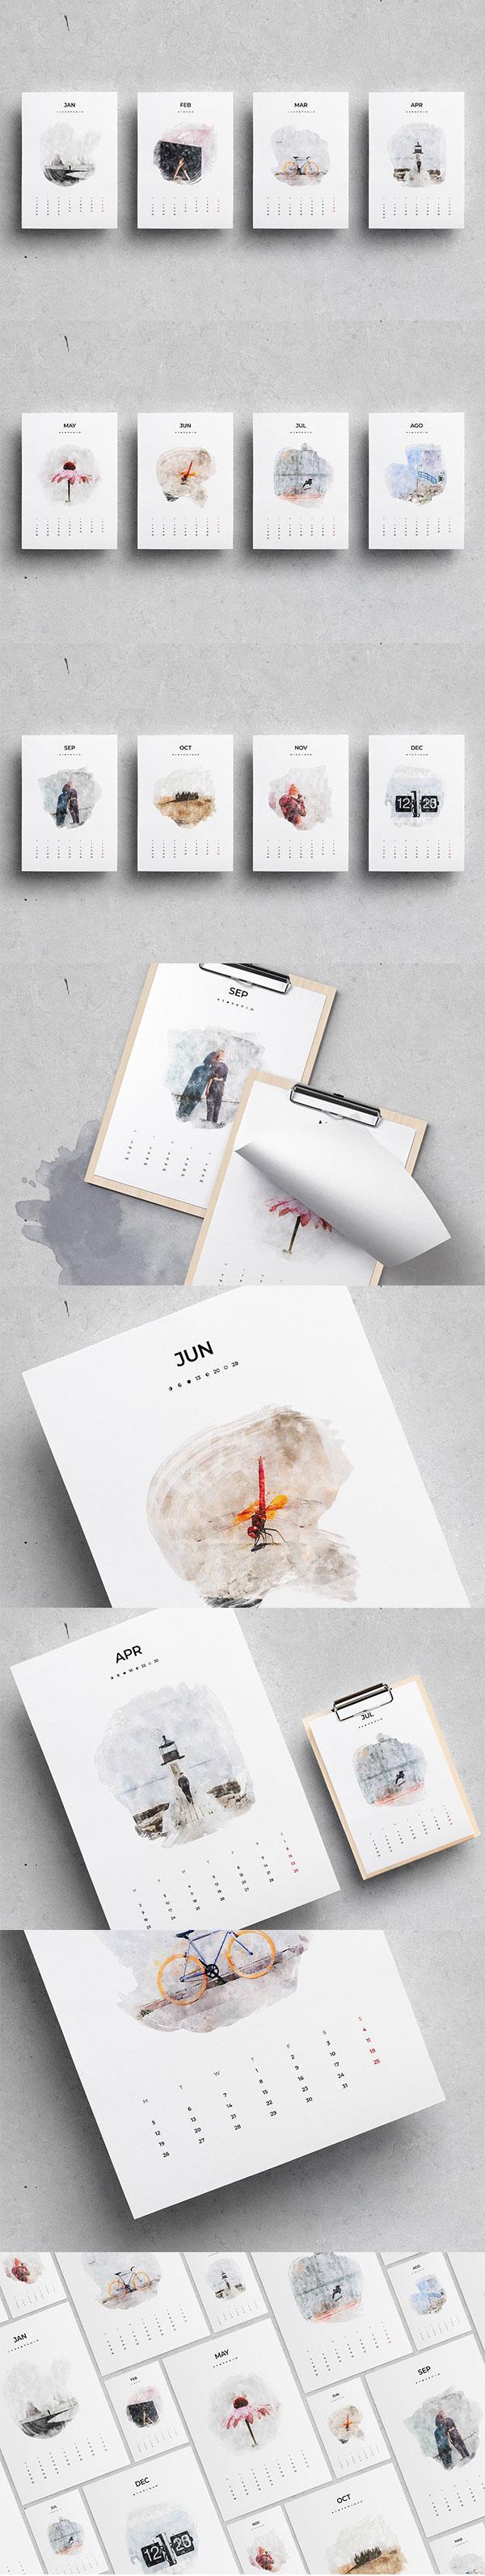 2018水彩ID日历